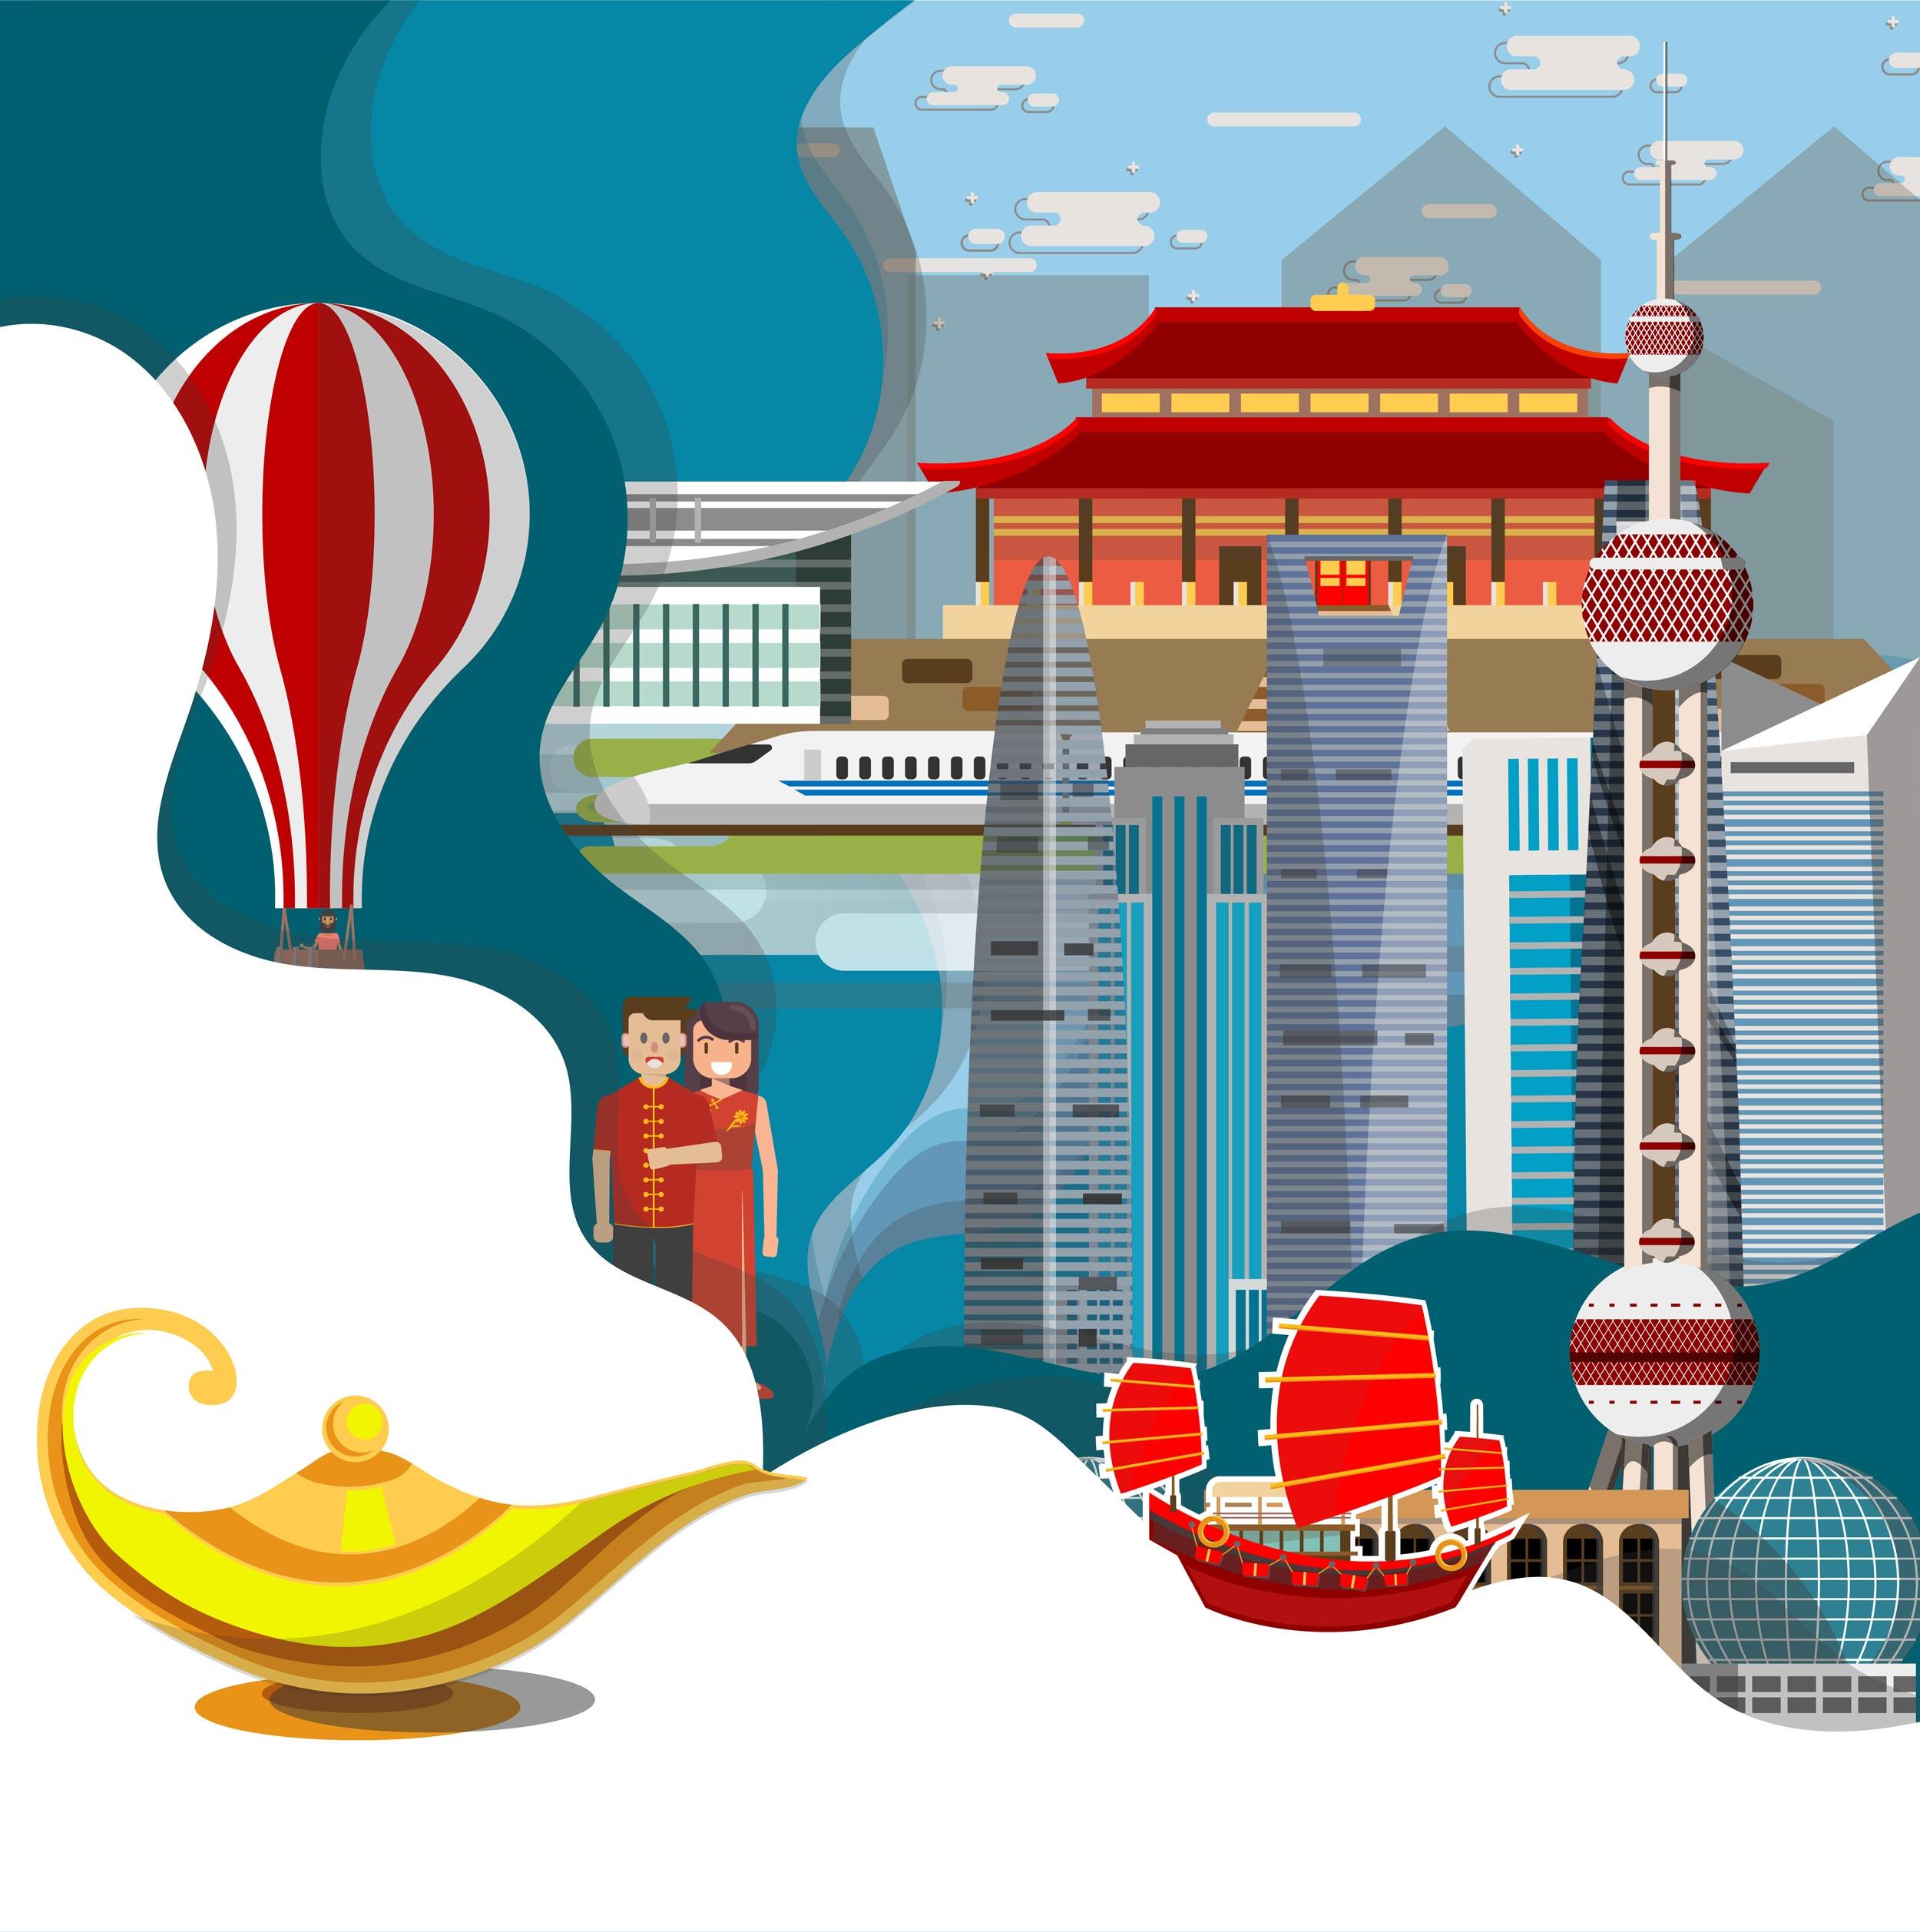 <span class='yzk_title_62120'>中国大城市标志性建筑矢量设计</span>